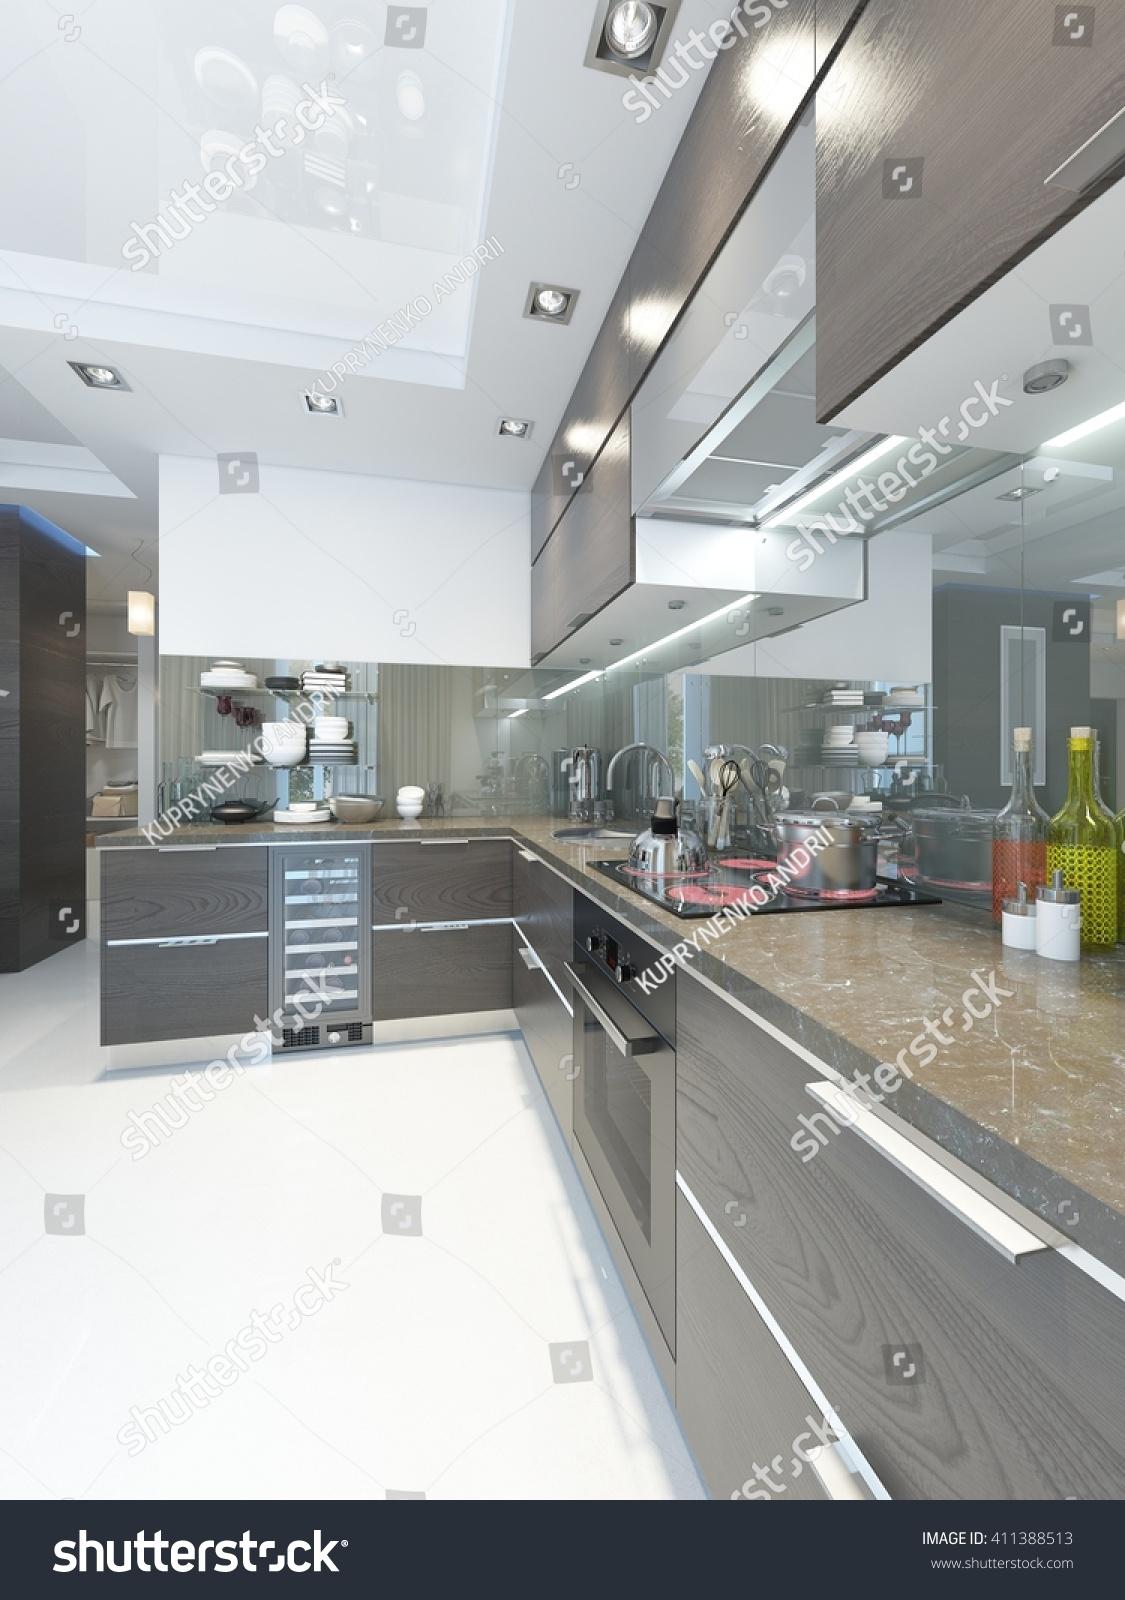 Kitchencontemporary Brown White Walls Marble Floors Stock Illustration 411388513